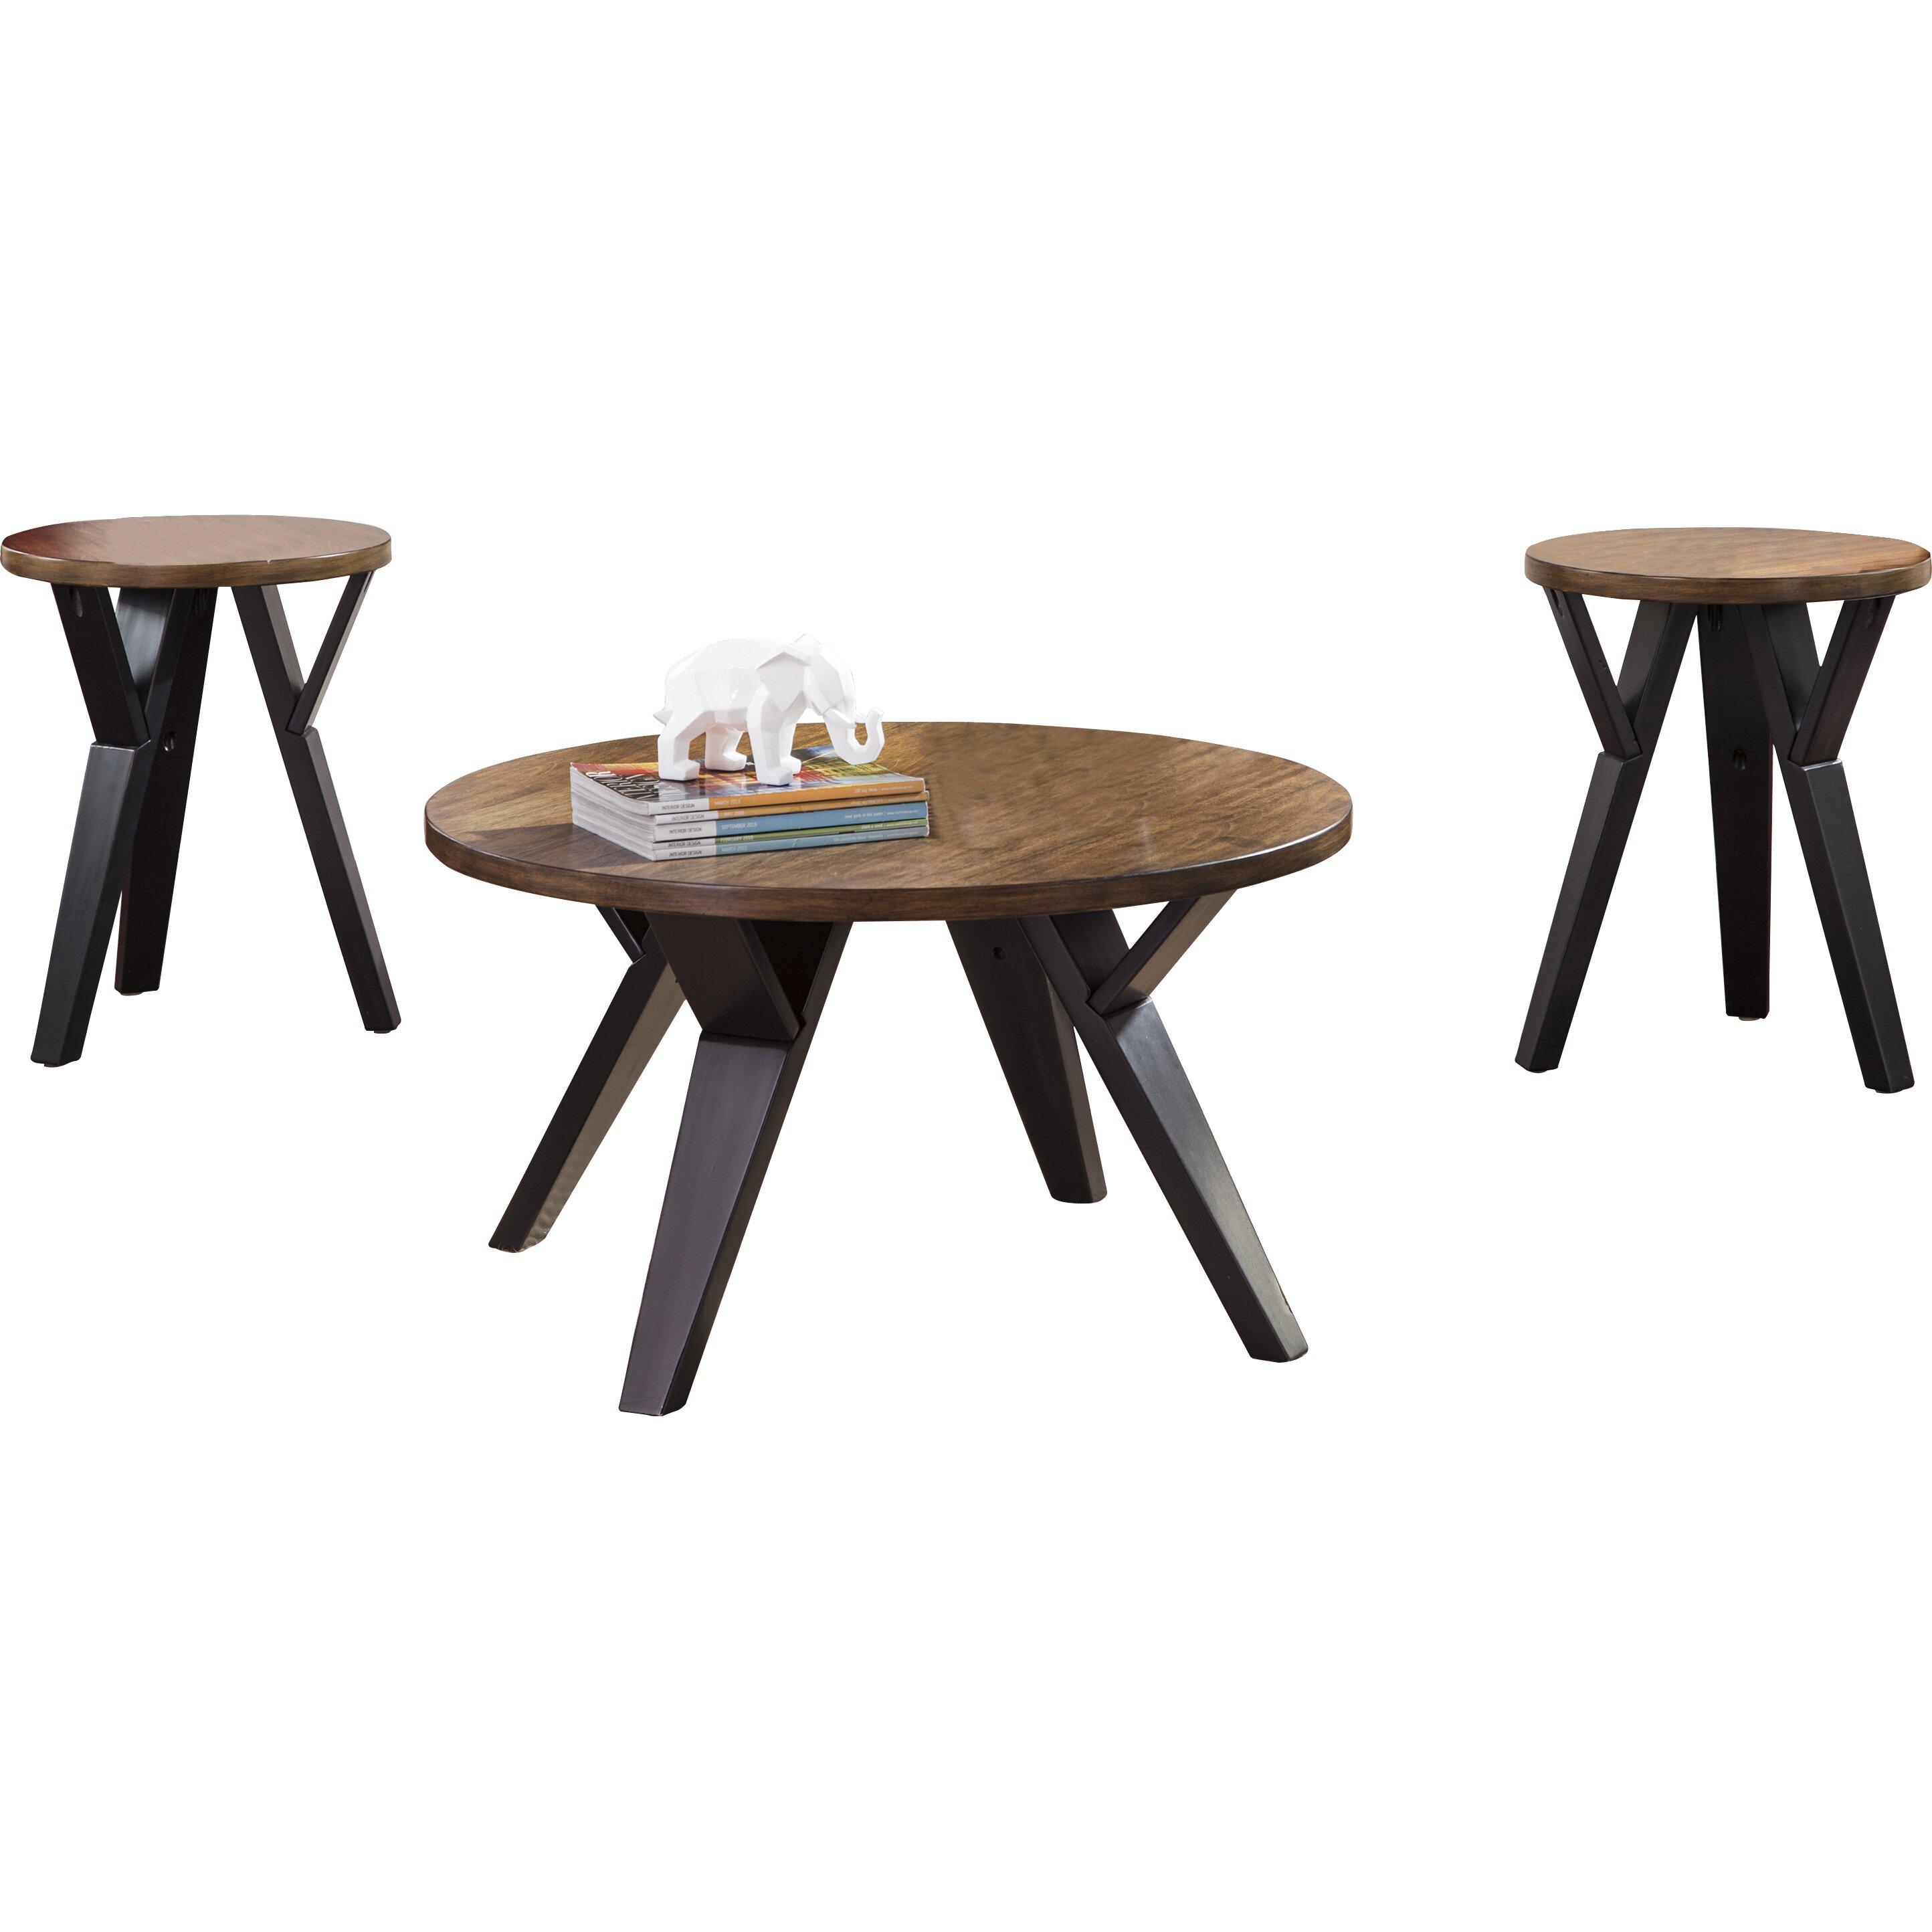 Signature Design by Ashley Ingel 3 Piece Coffee Table Set u0026 Reviews : Wayfair